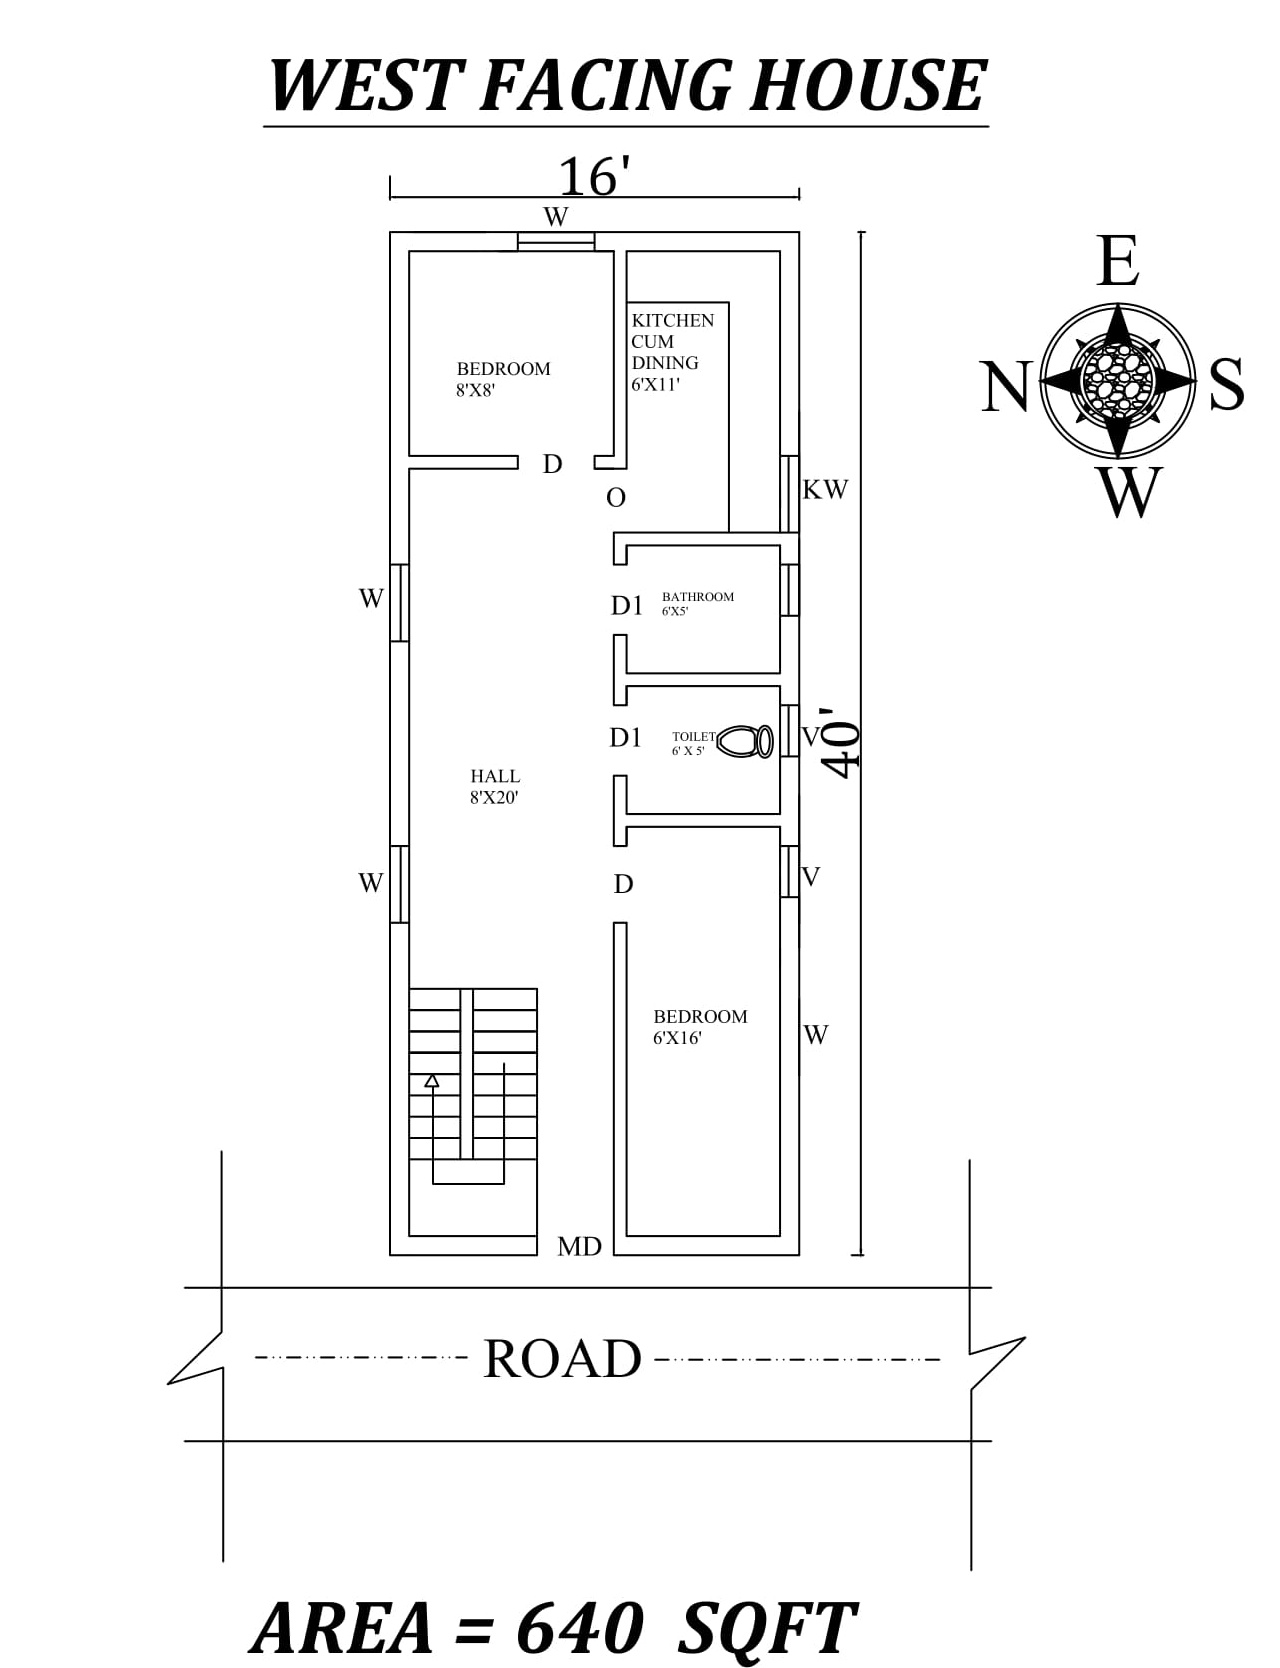 16 x40 640 sqft 2bhk west facing house plan as per